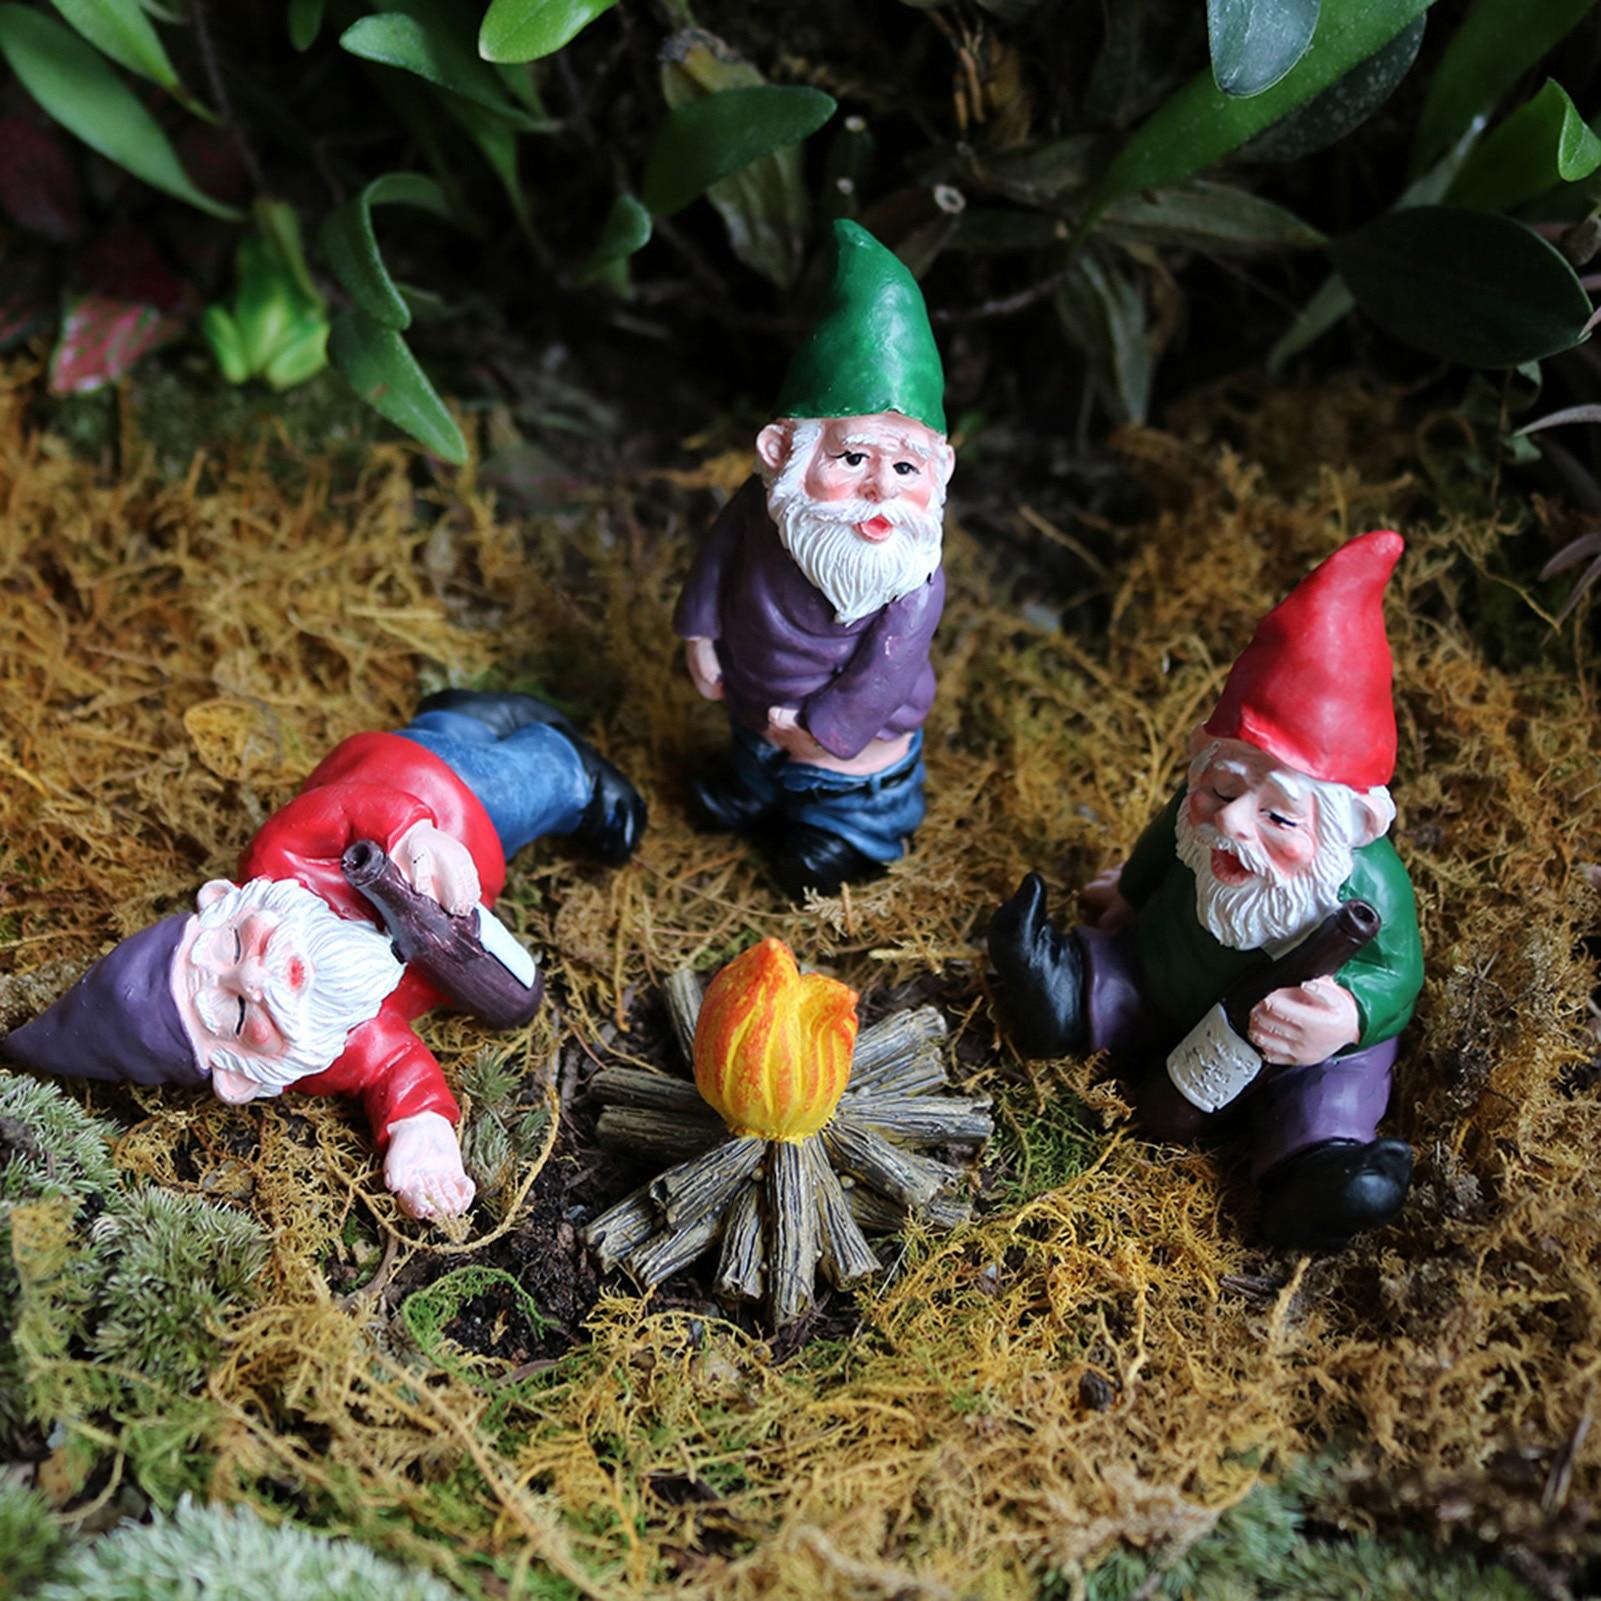 Fairy Garden Tiny Gnomes Statue Garden Courtyard Ornaments Fairy Resin Micro Landscape Outdoor Miniature Resin Figurine Ornament